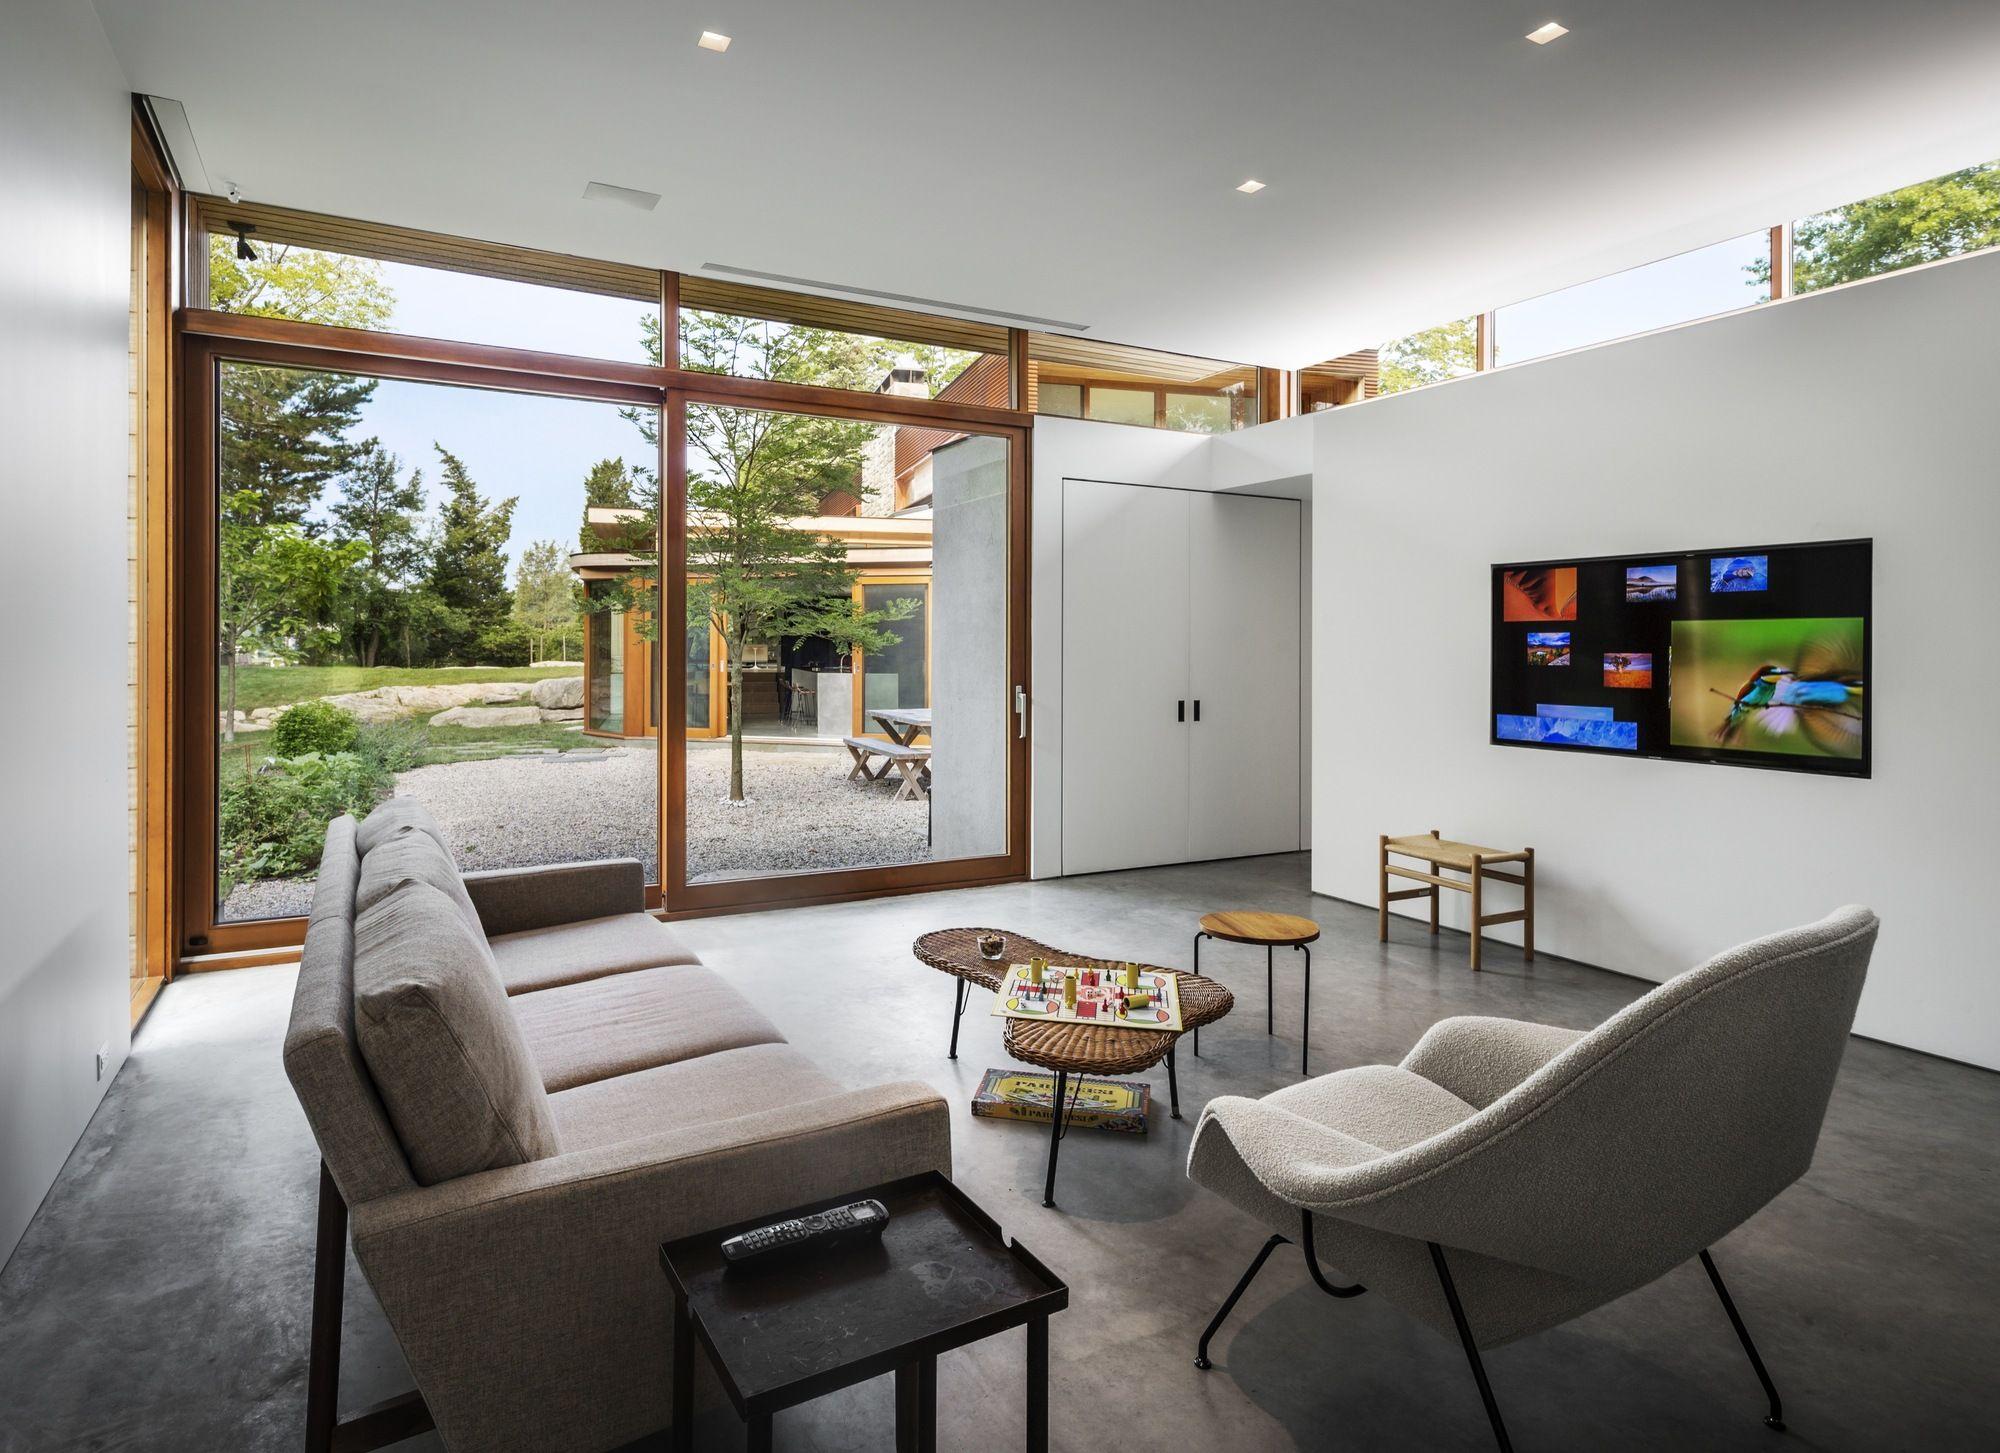 Galeria - Residência Stonington / Joeb Moore  Janela alta recuada, funciona como lightshelf